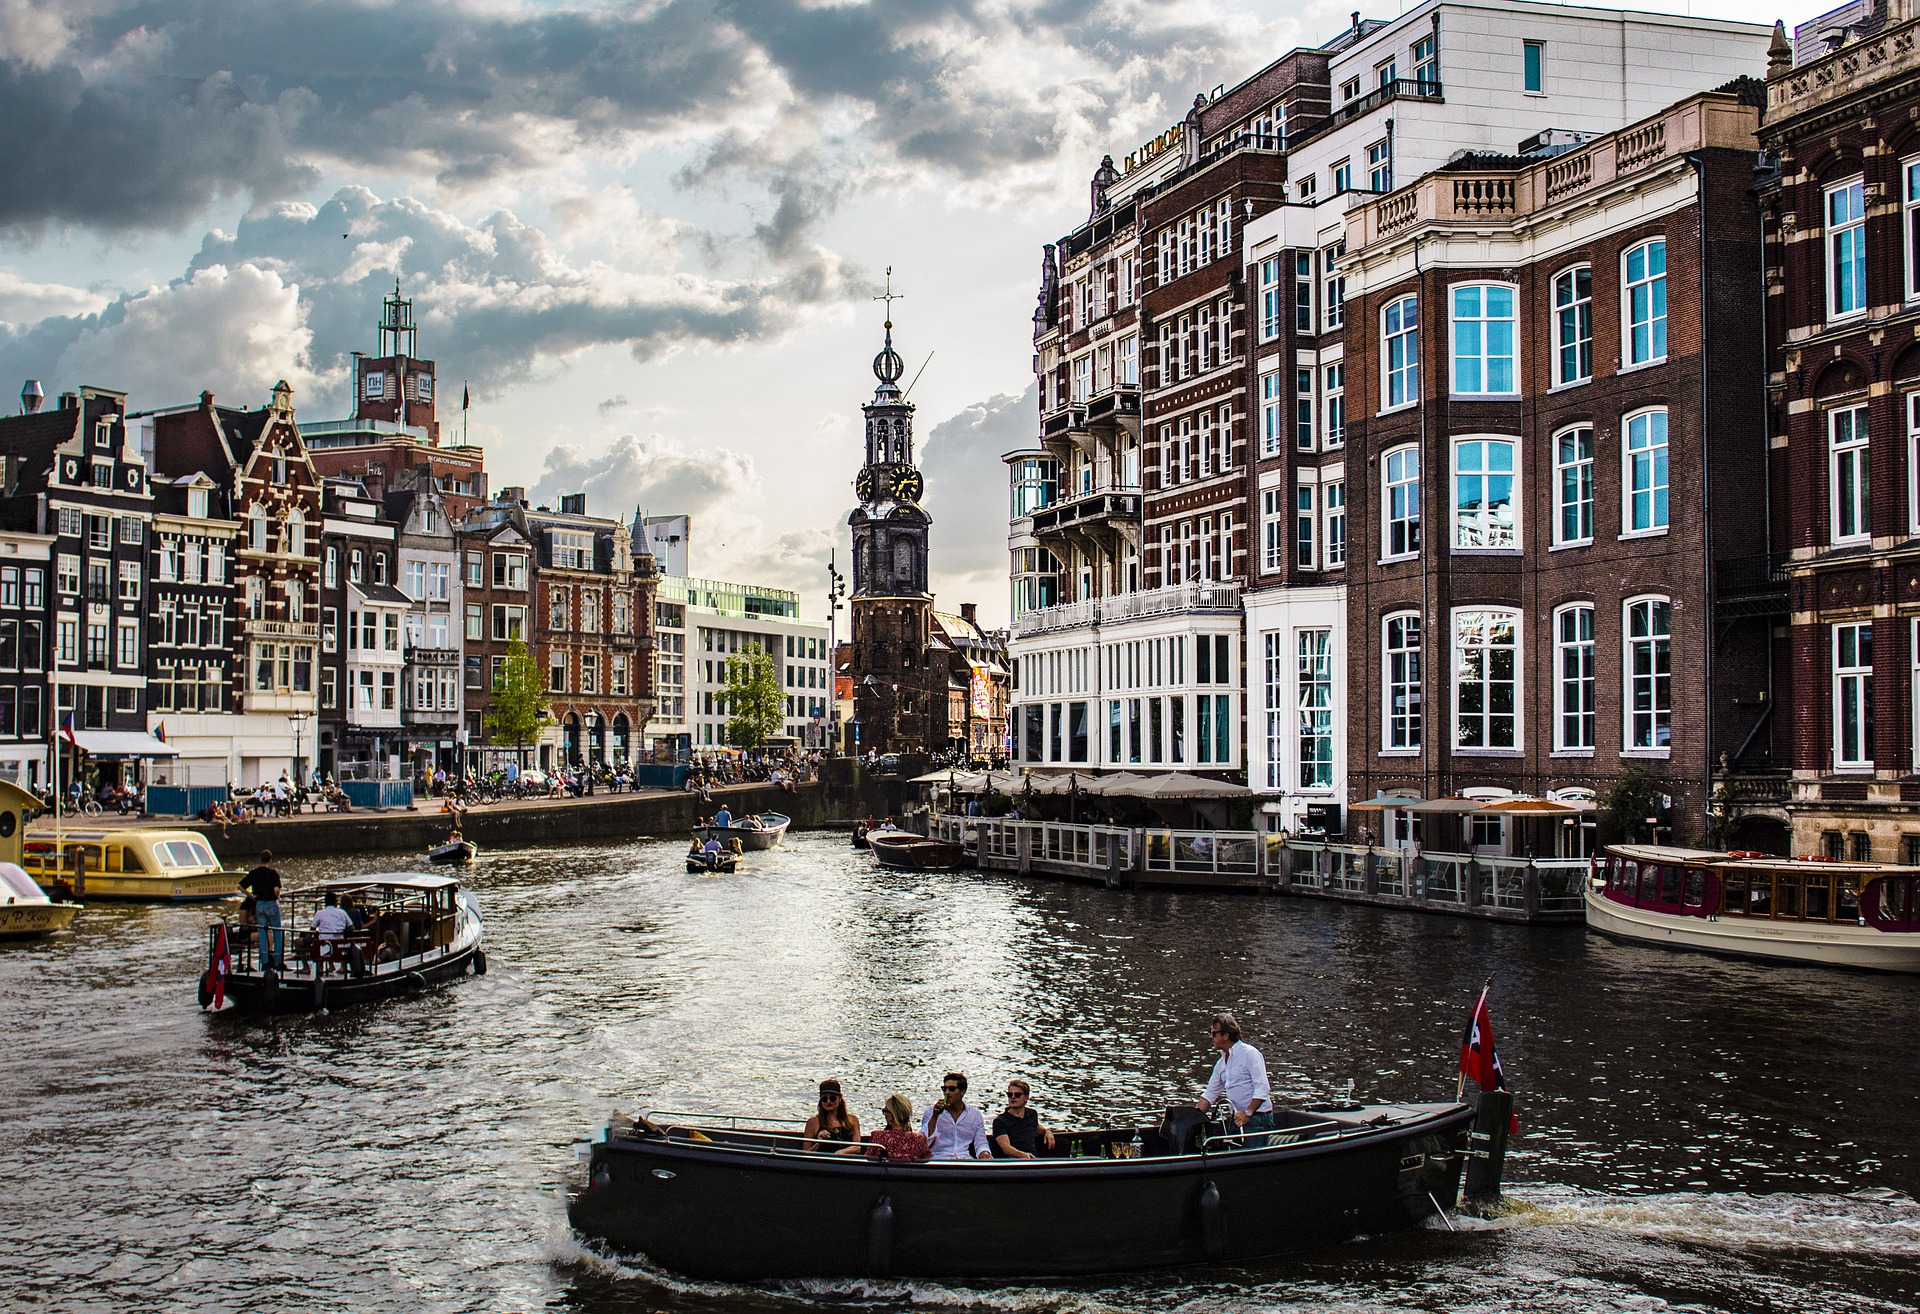 vacances Amsterdam, vacances